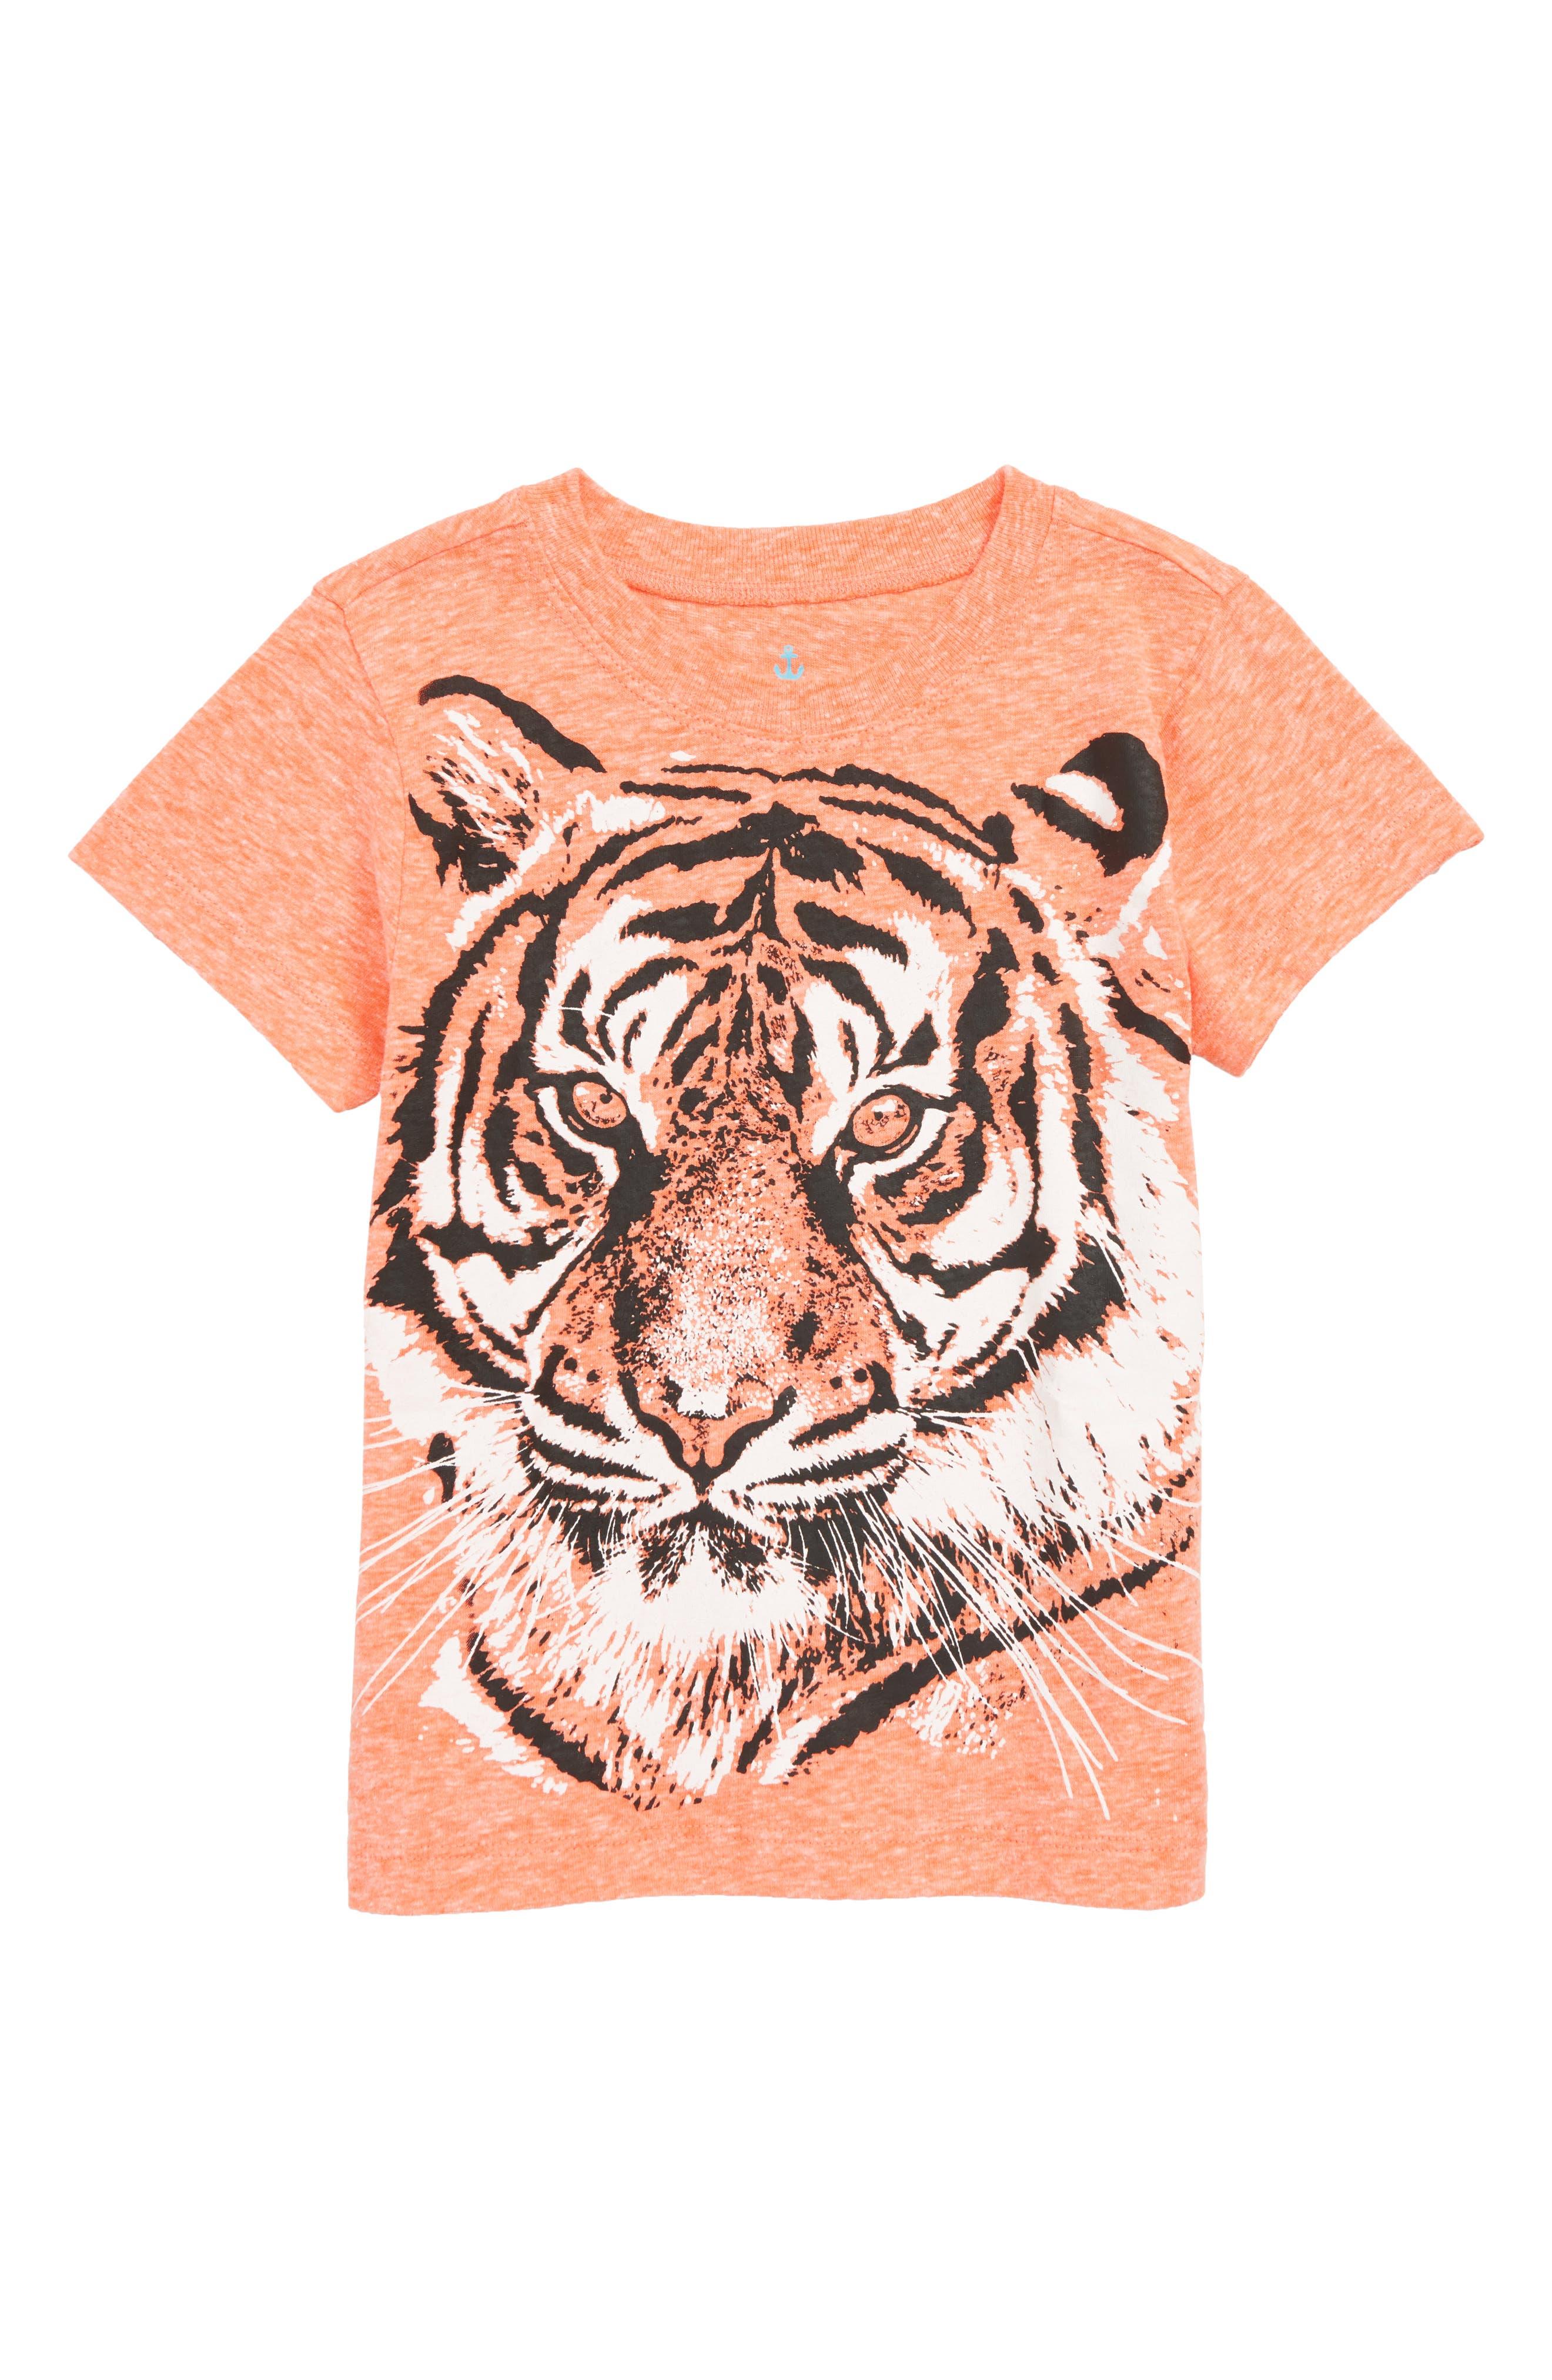 CREWCUTS BY J.CREW Tiger T-Shirt, Main, color, SWEET MELON